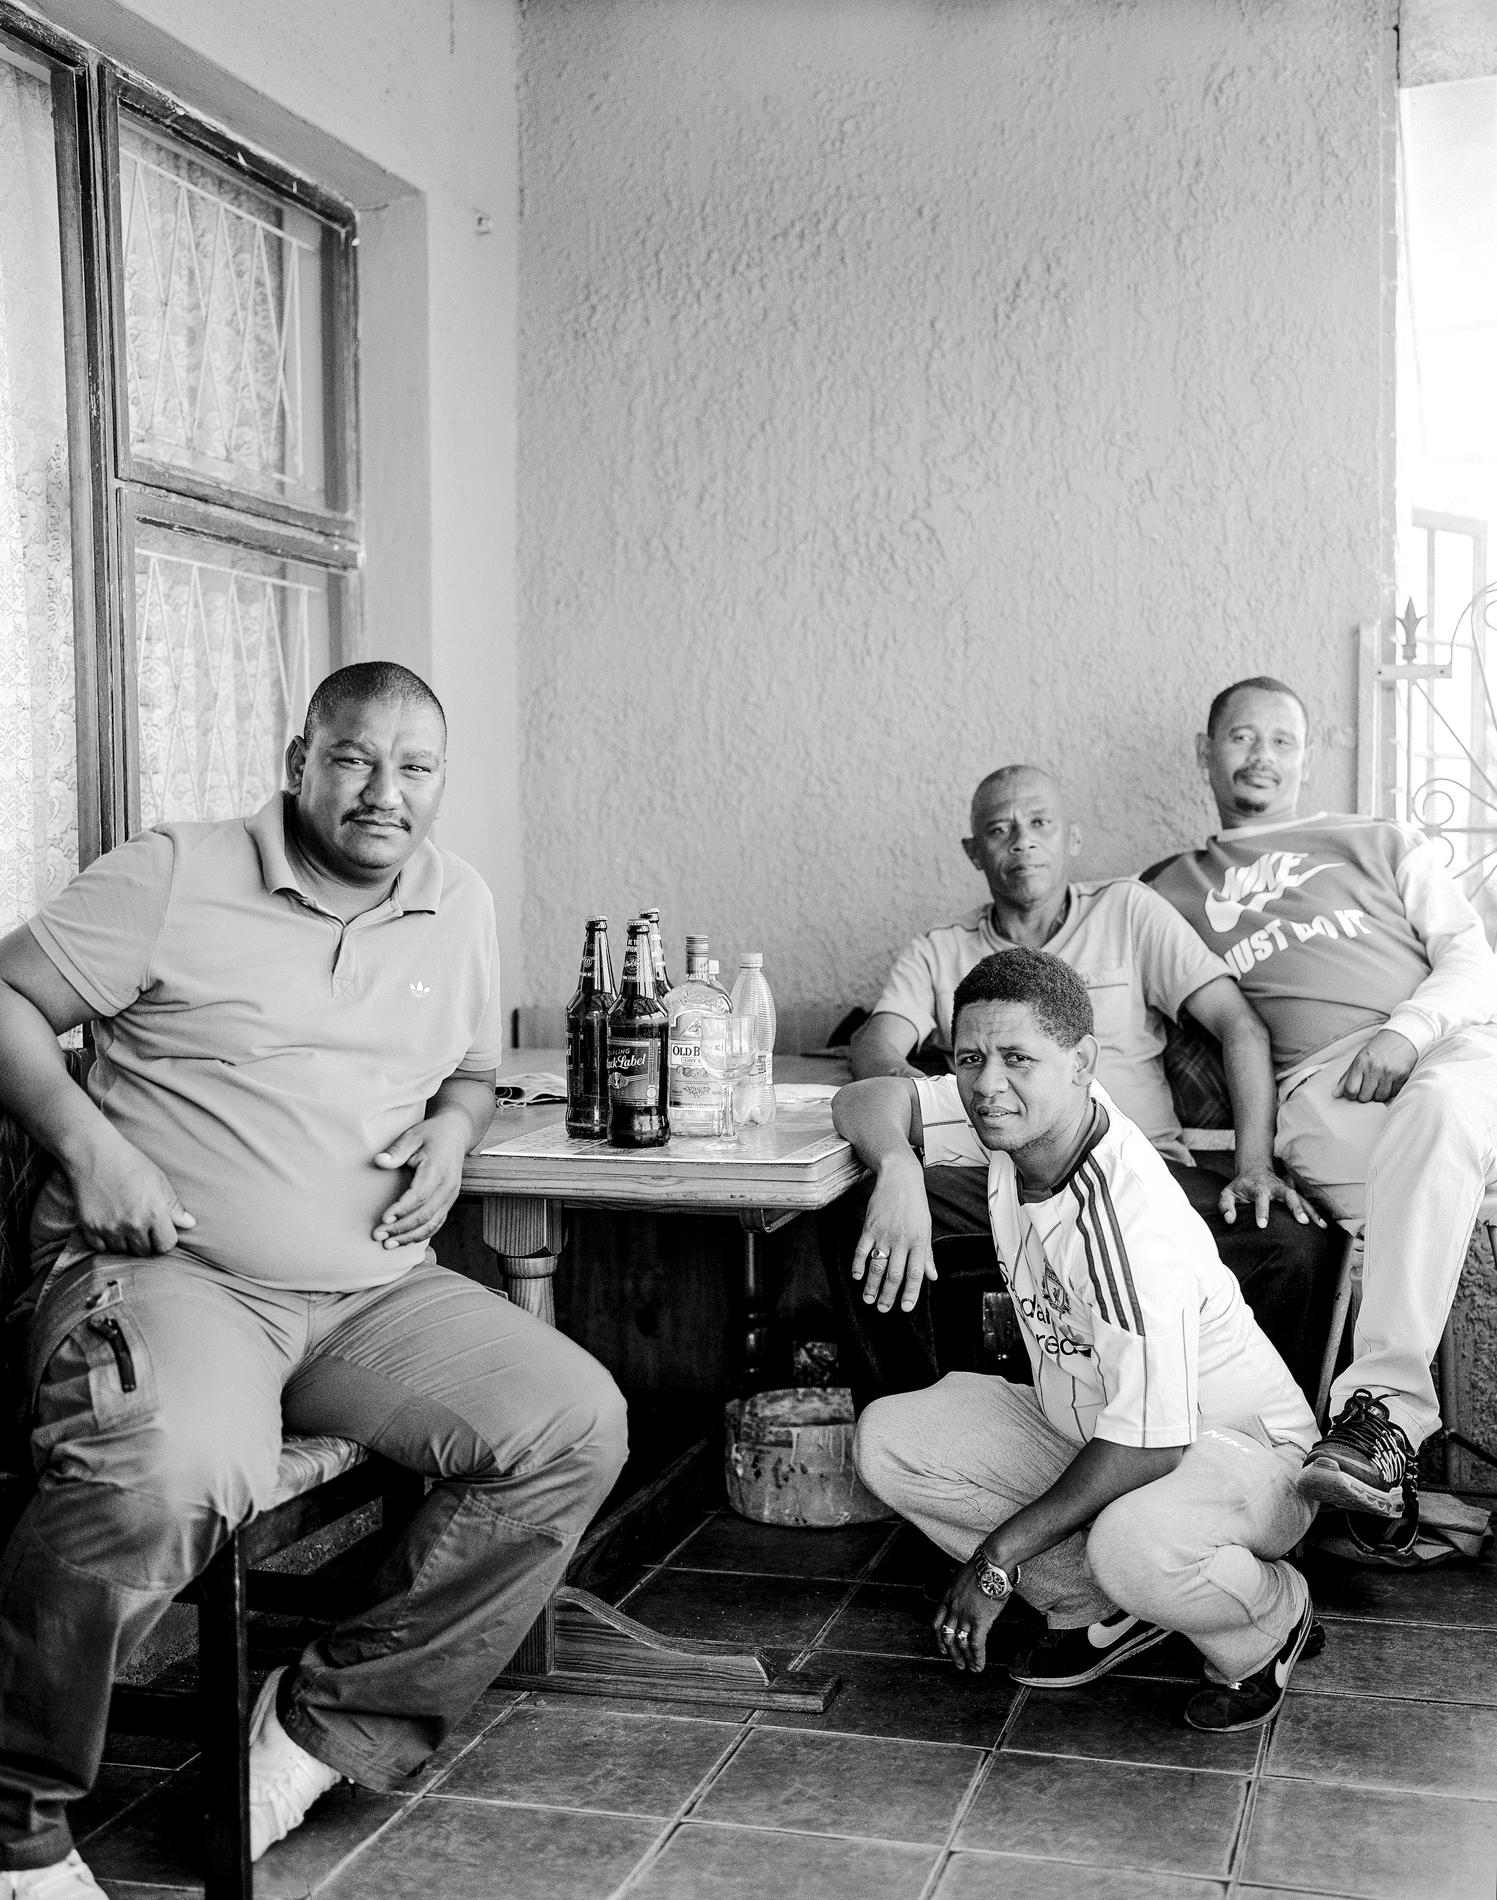 'The Four Men'